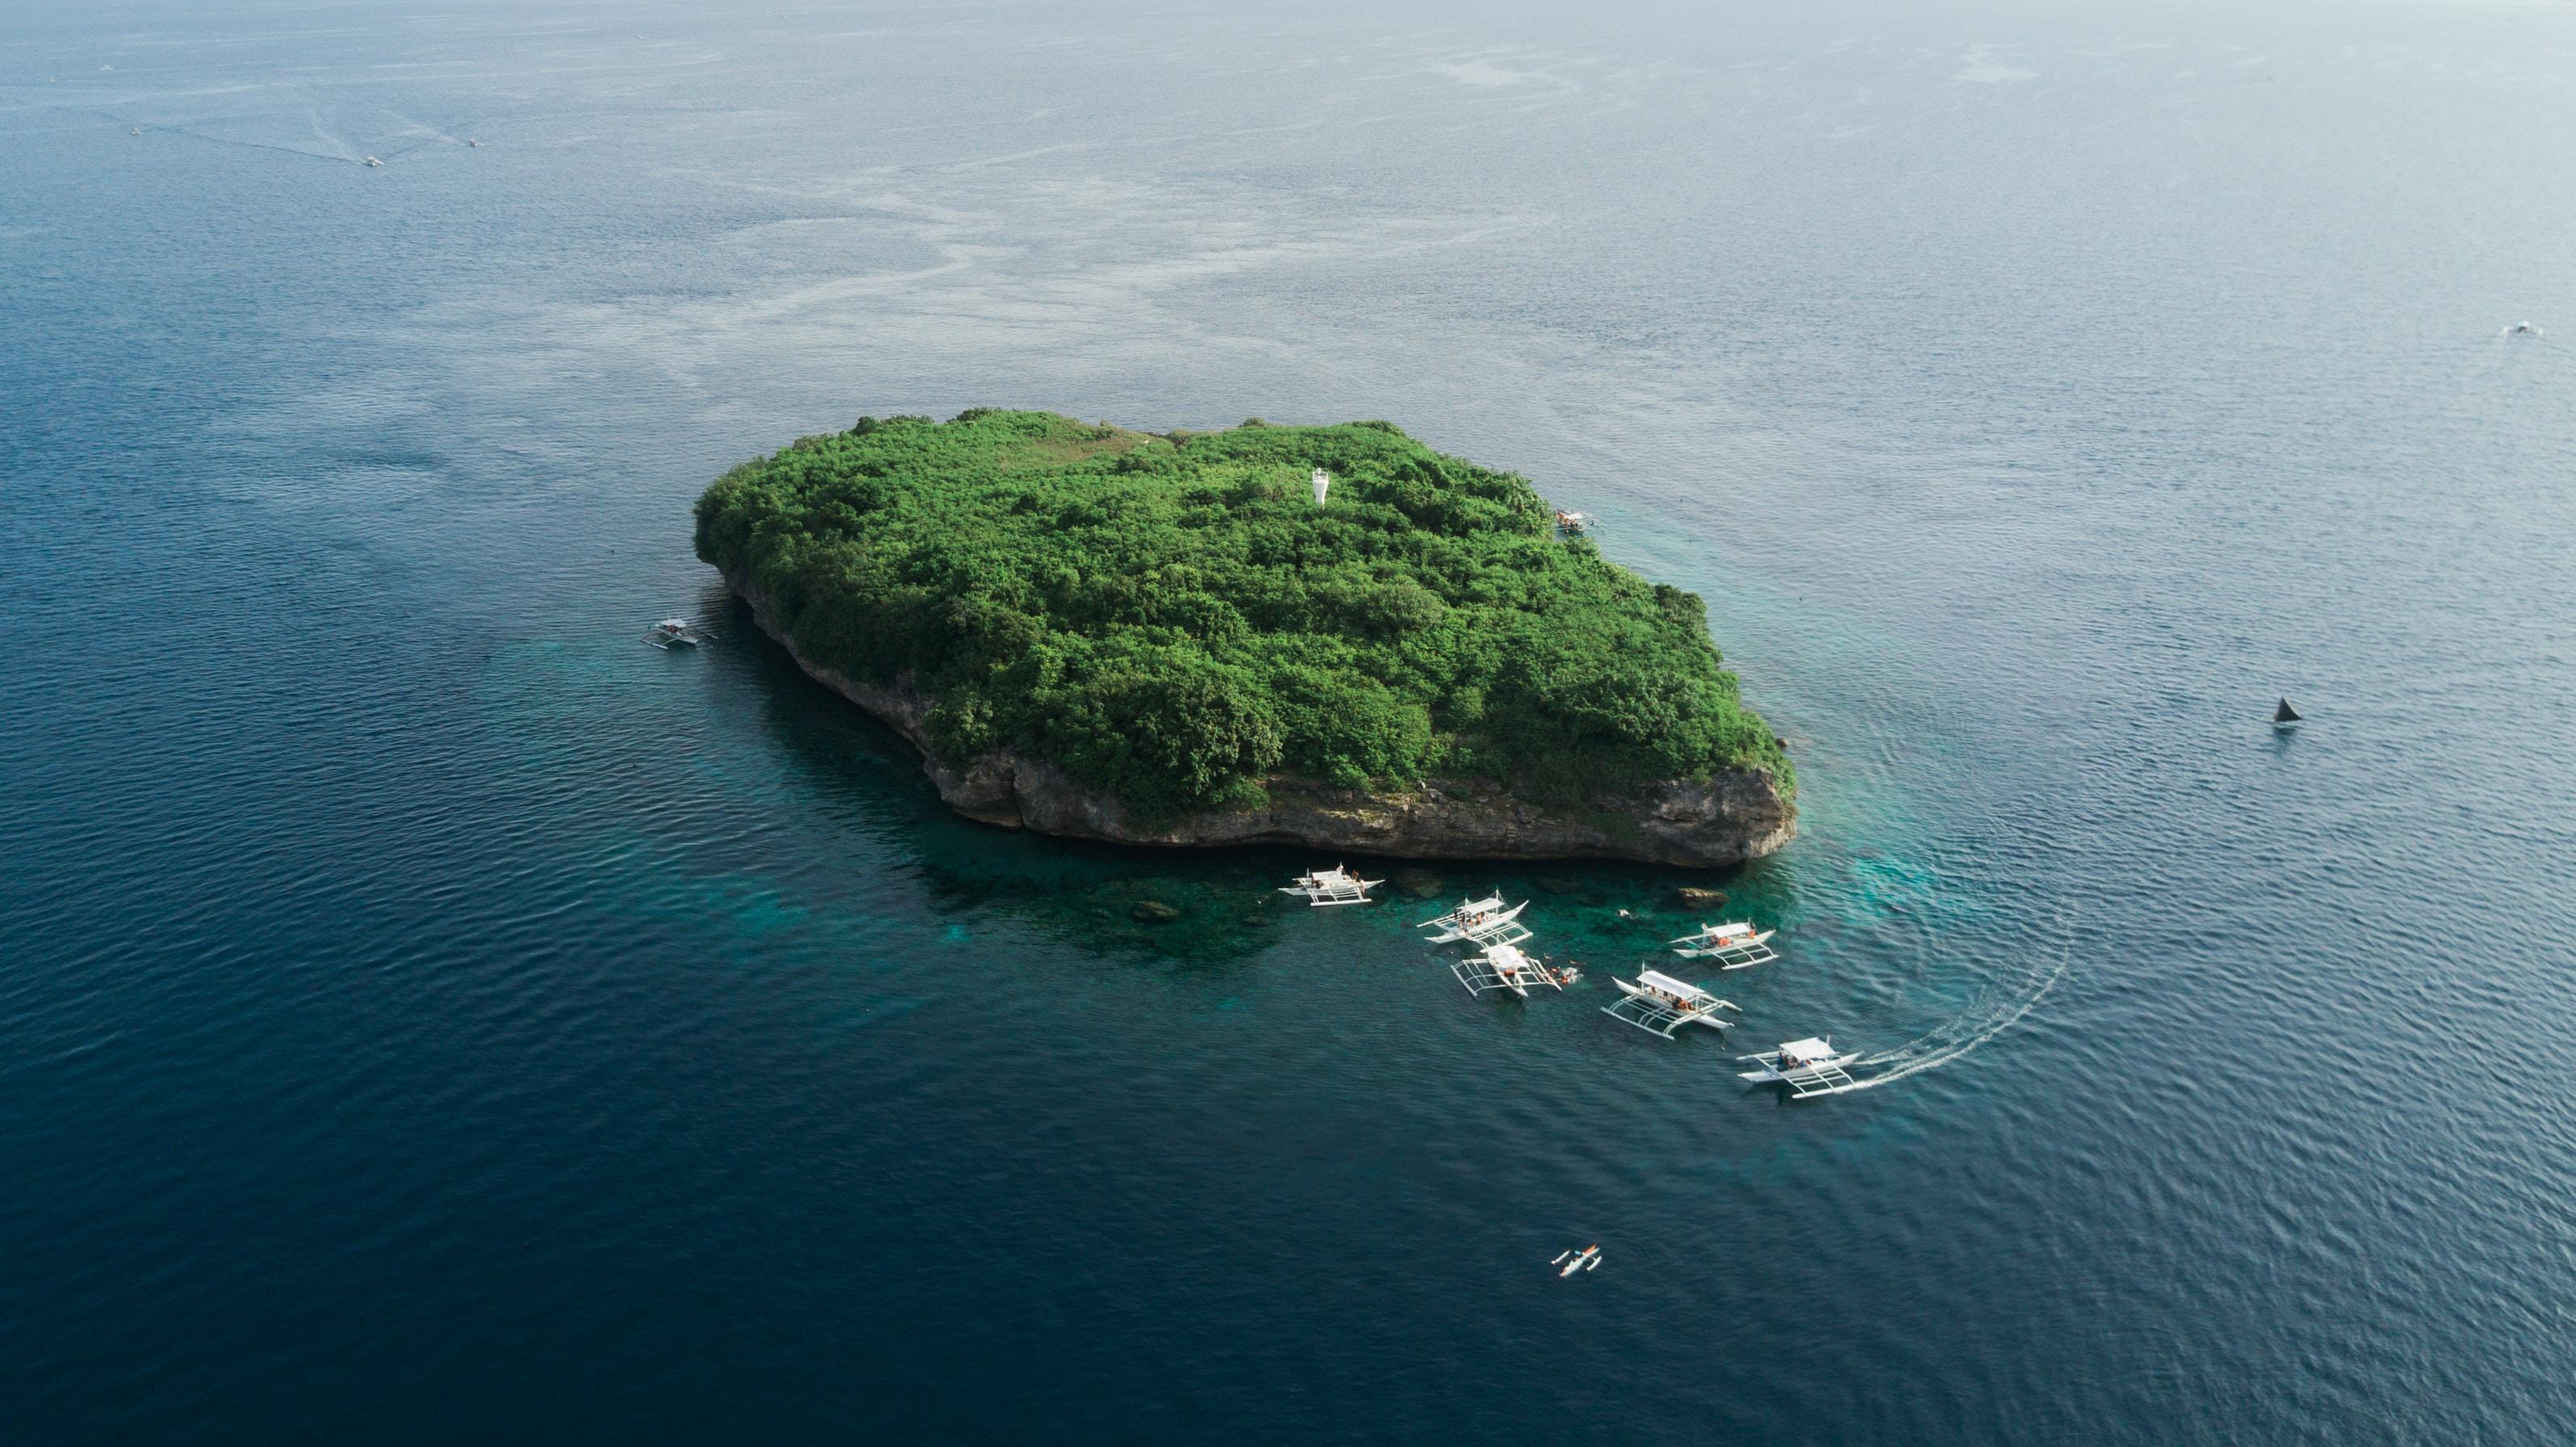 bird's eye view of island